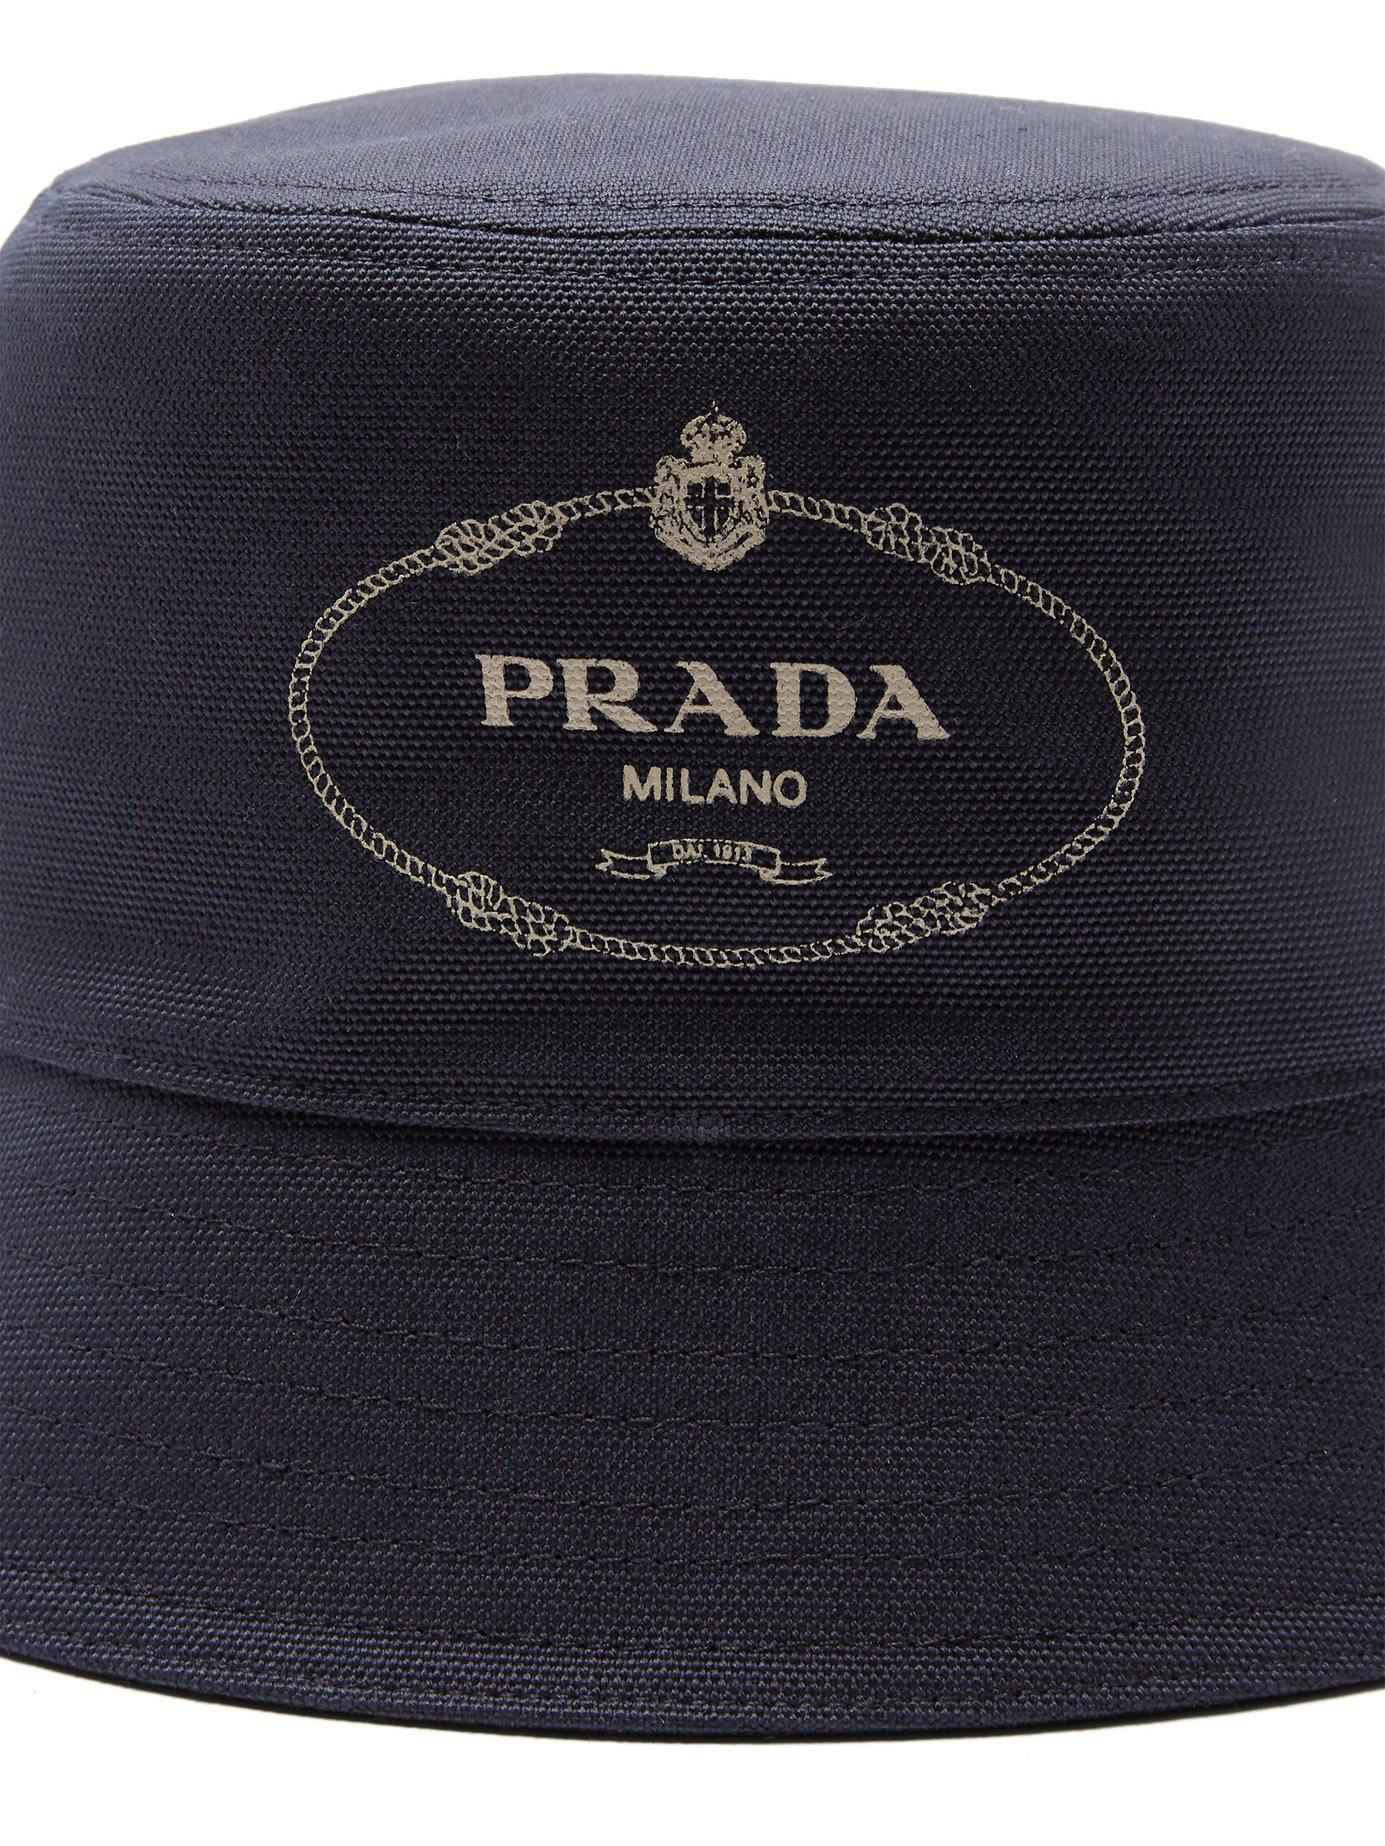 9982747c068 Lyst - Prada Logo Print Cotton Canvas Bucket Hat in Blue for Men - Save 6%